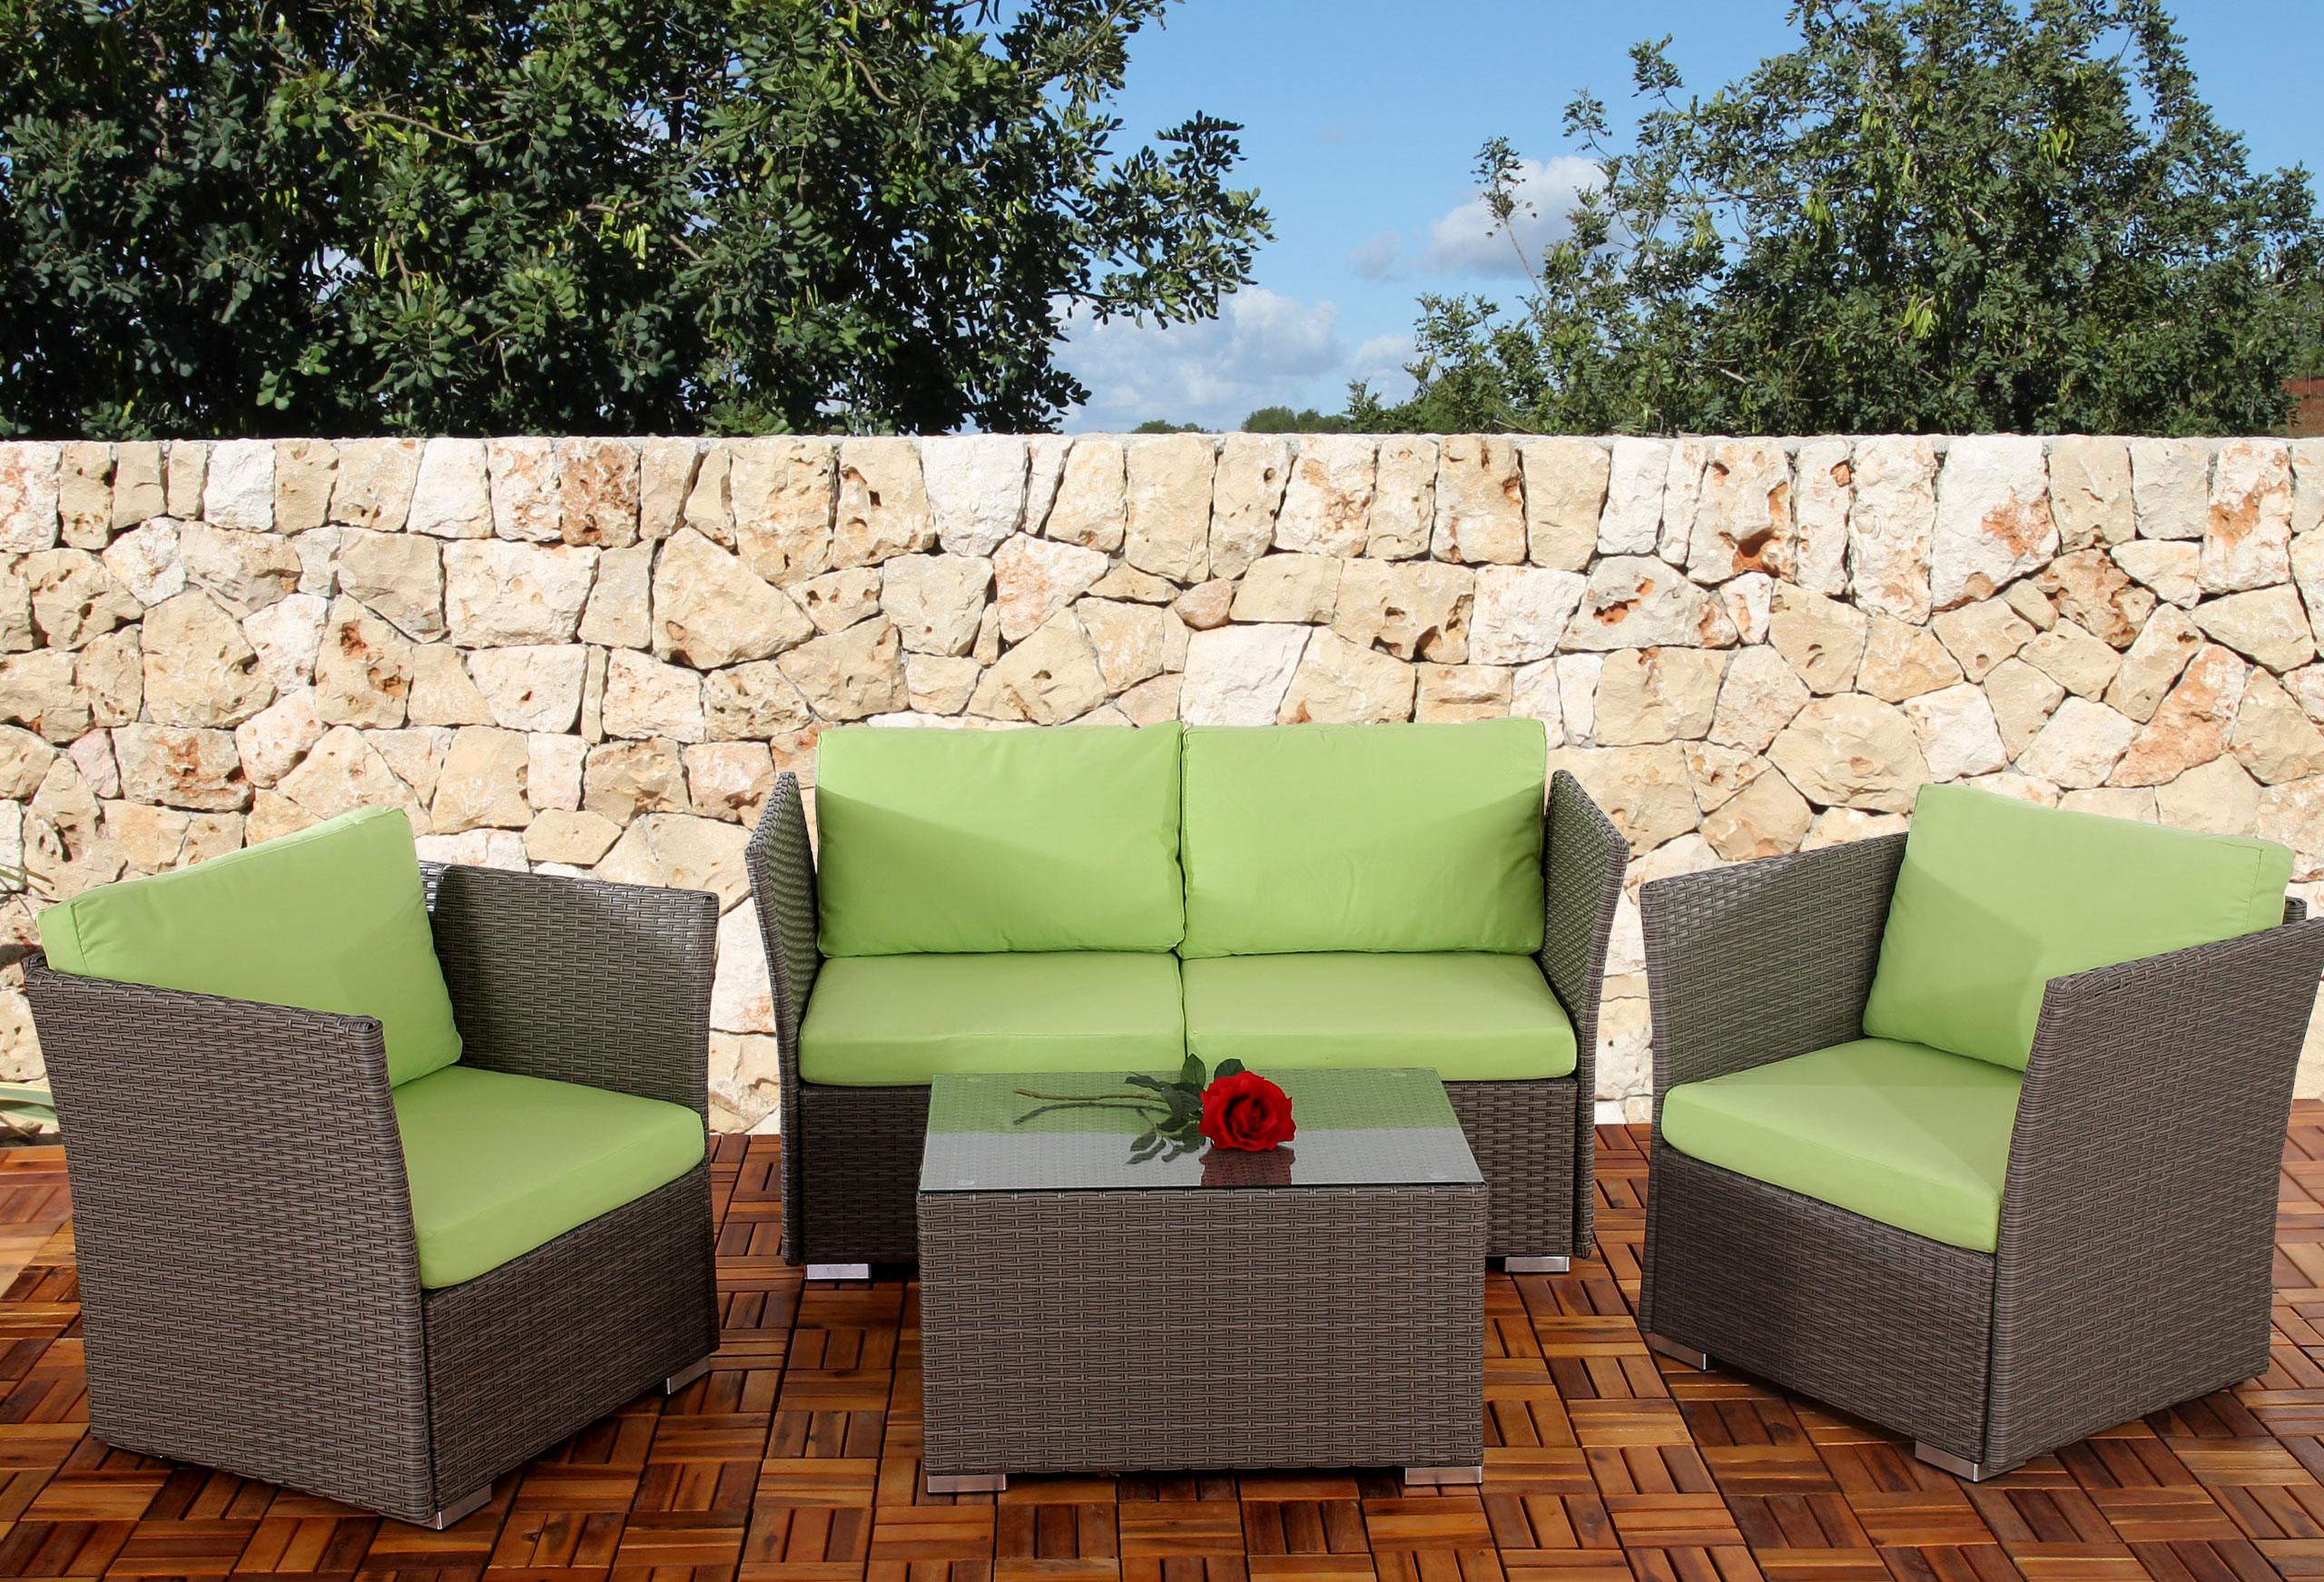 10x seitenteil f r poly rattan sofa siena modulare gastronomie qualit t grau. Black Bedroom Furniture Sets. Home Design Ideas